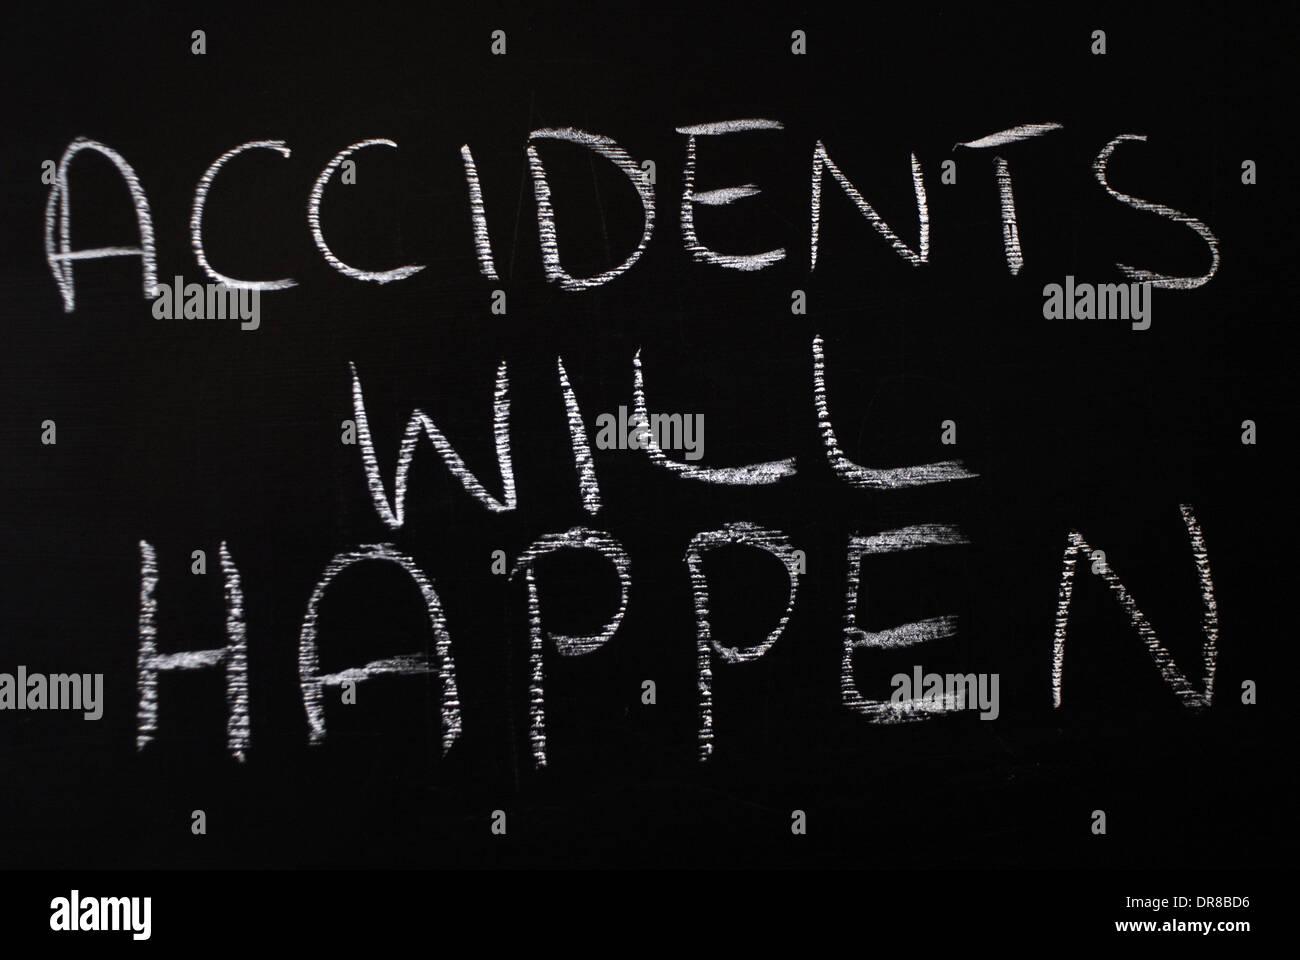 chalk writing -  accidents will happen. - words written on blackboard. - Stock Image